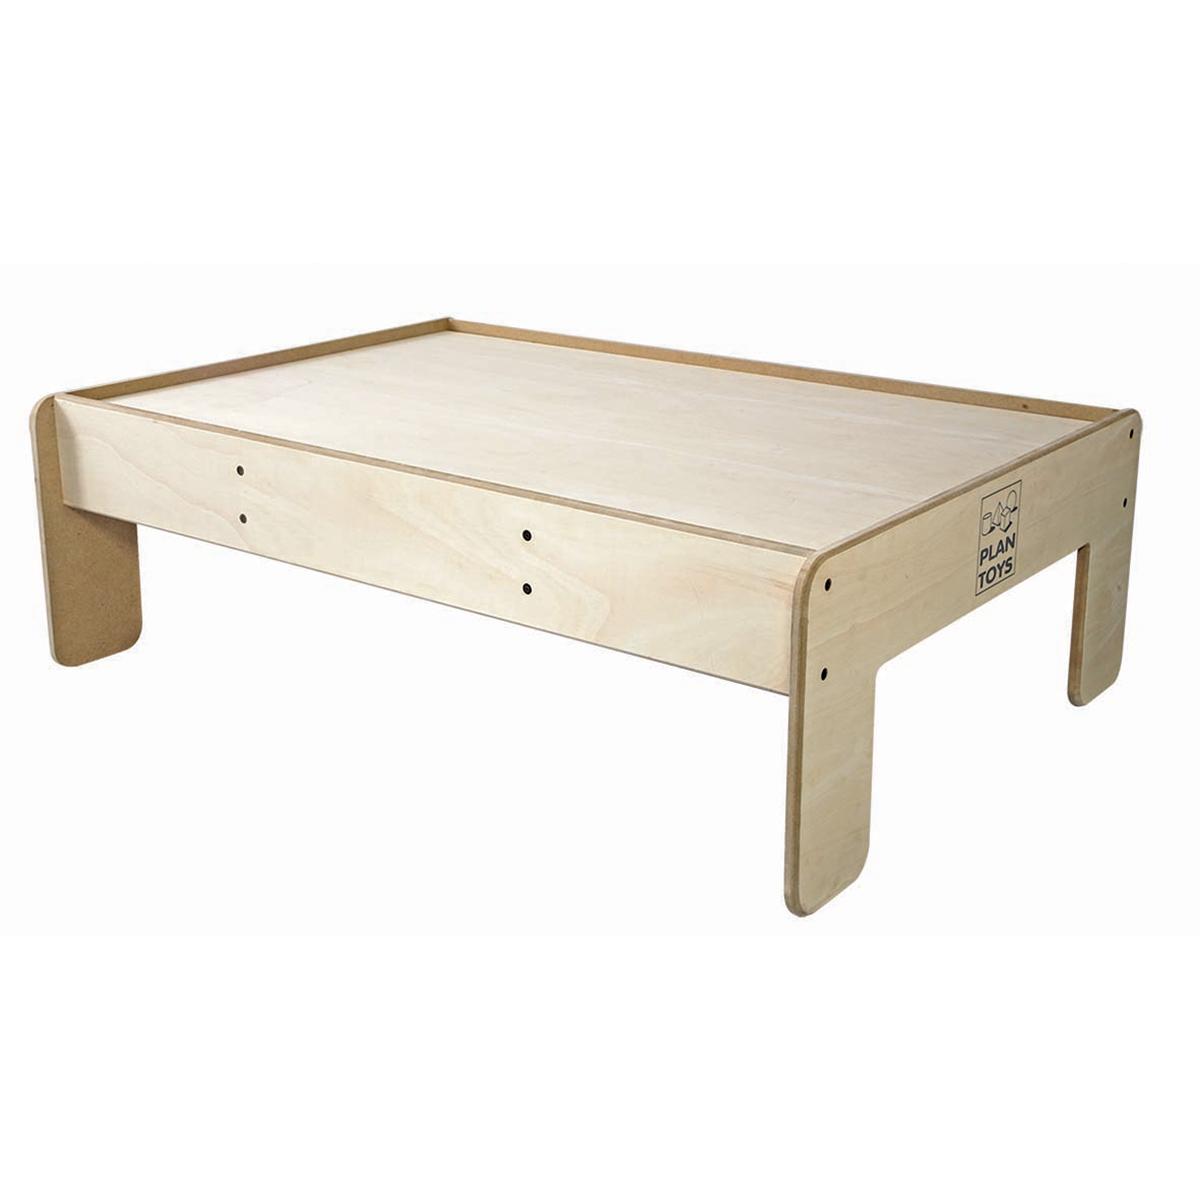 8247 play table 80 x 120 cm-rgb GQKTDDF